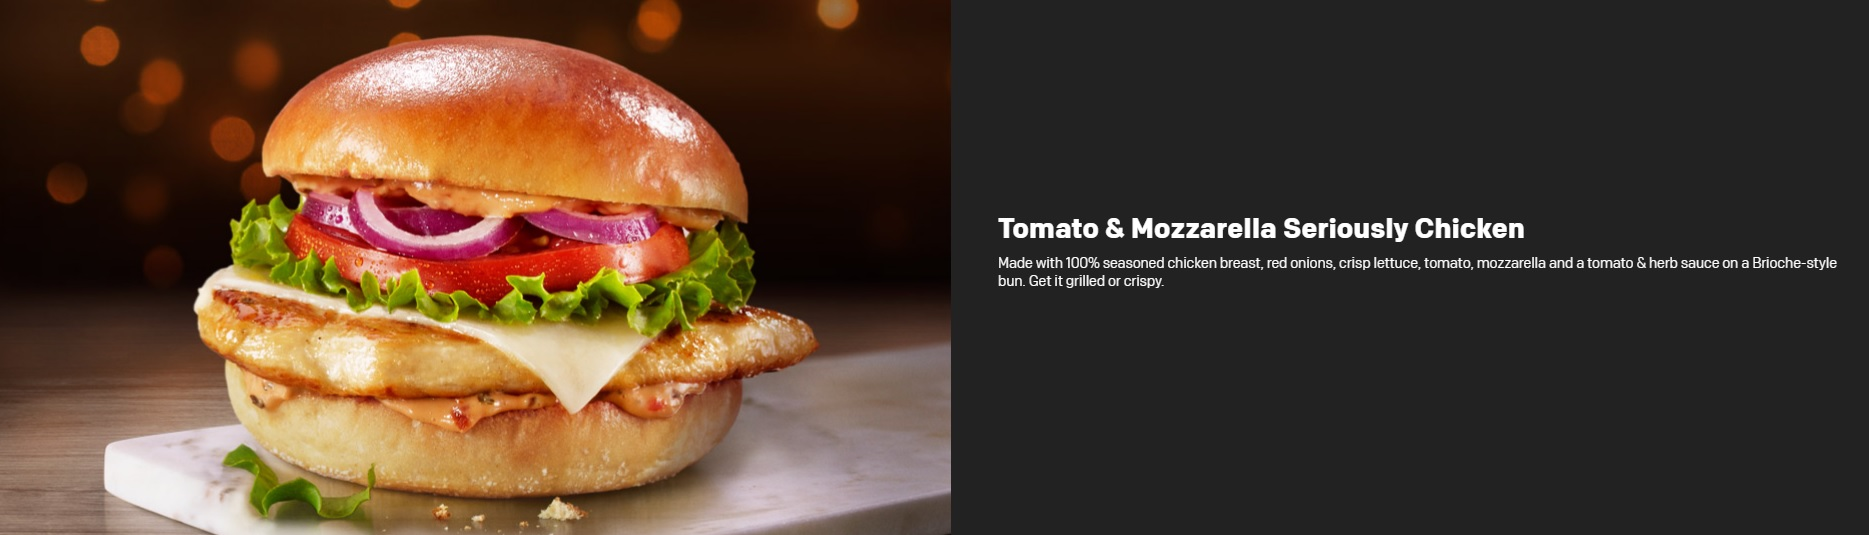 McDonald's Seriously Festive Menu - Tomato & Mozzarella Seriously Chicken